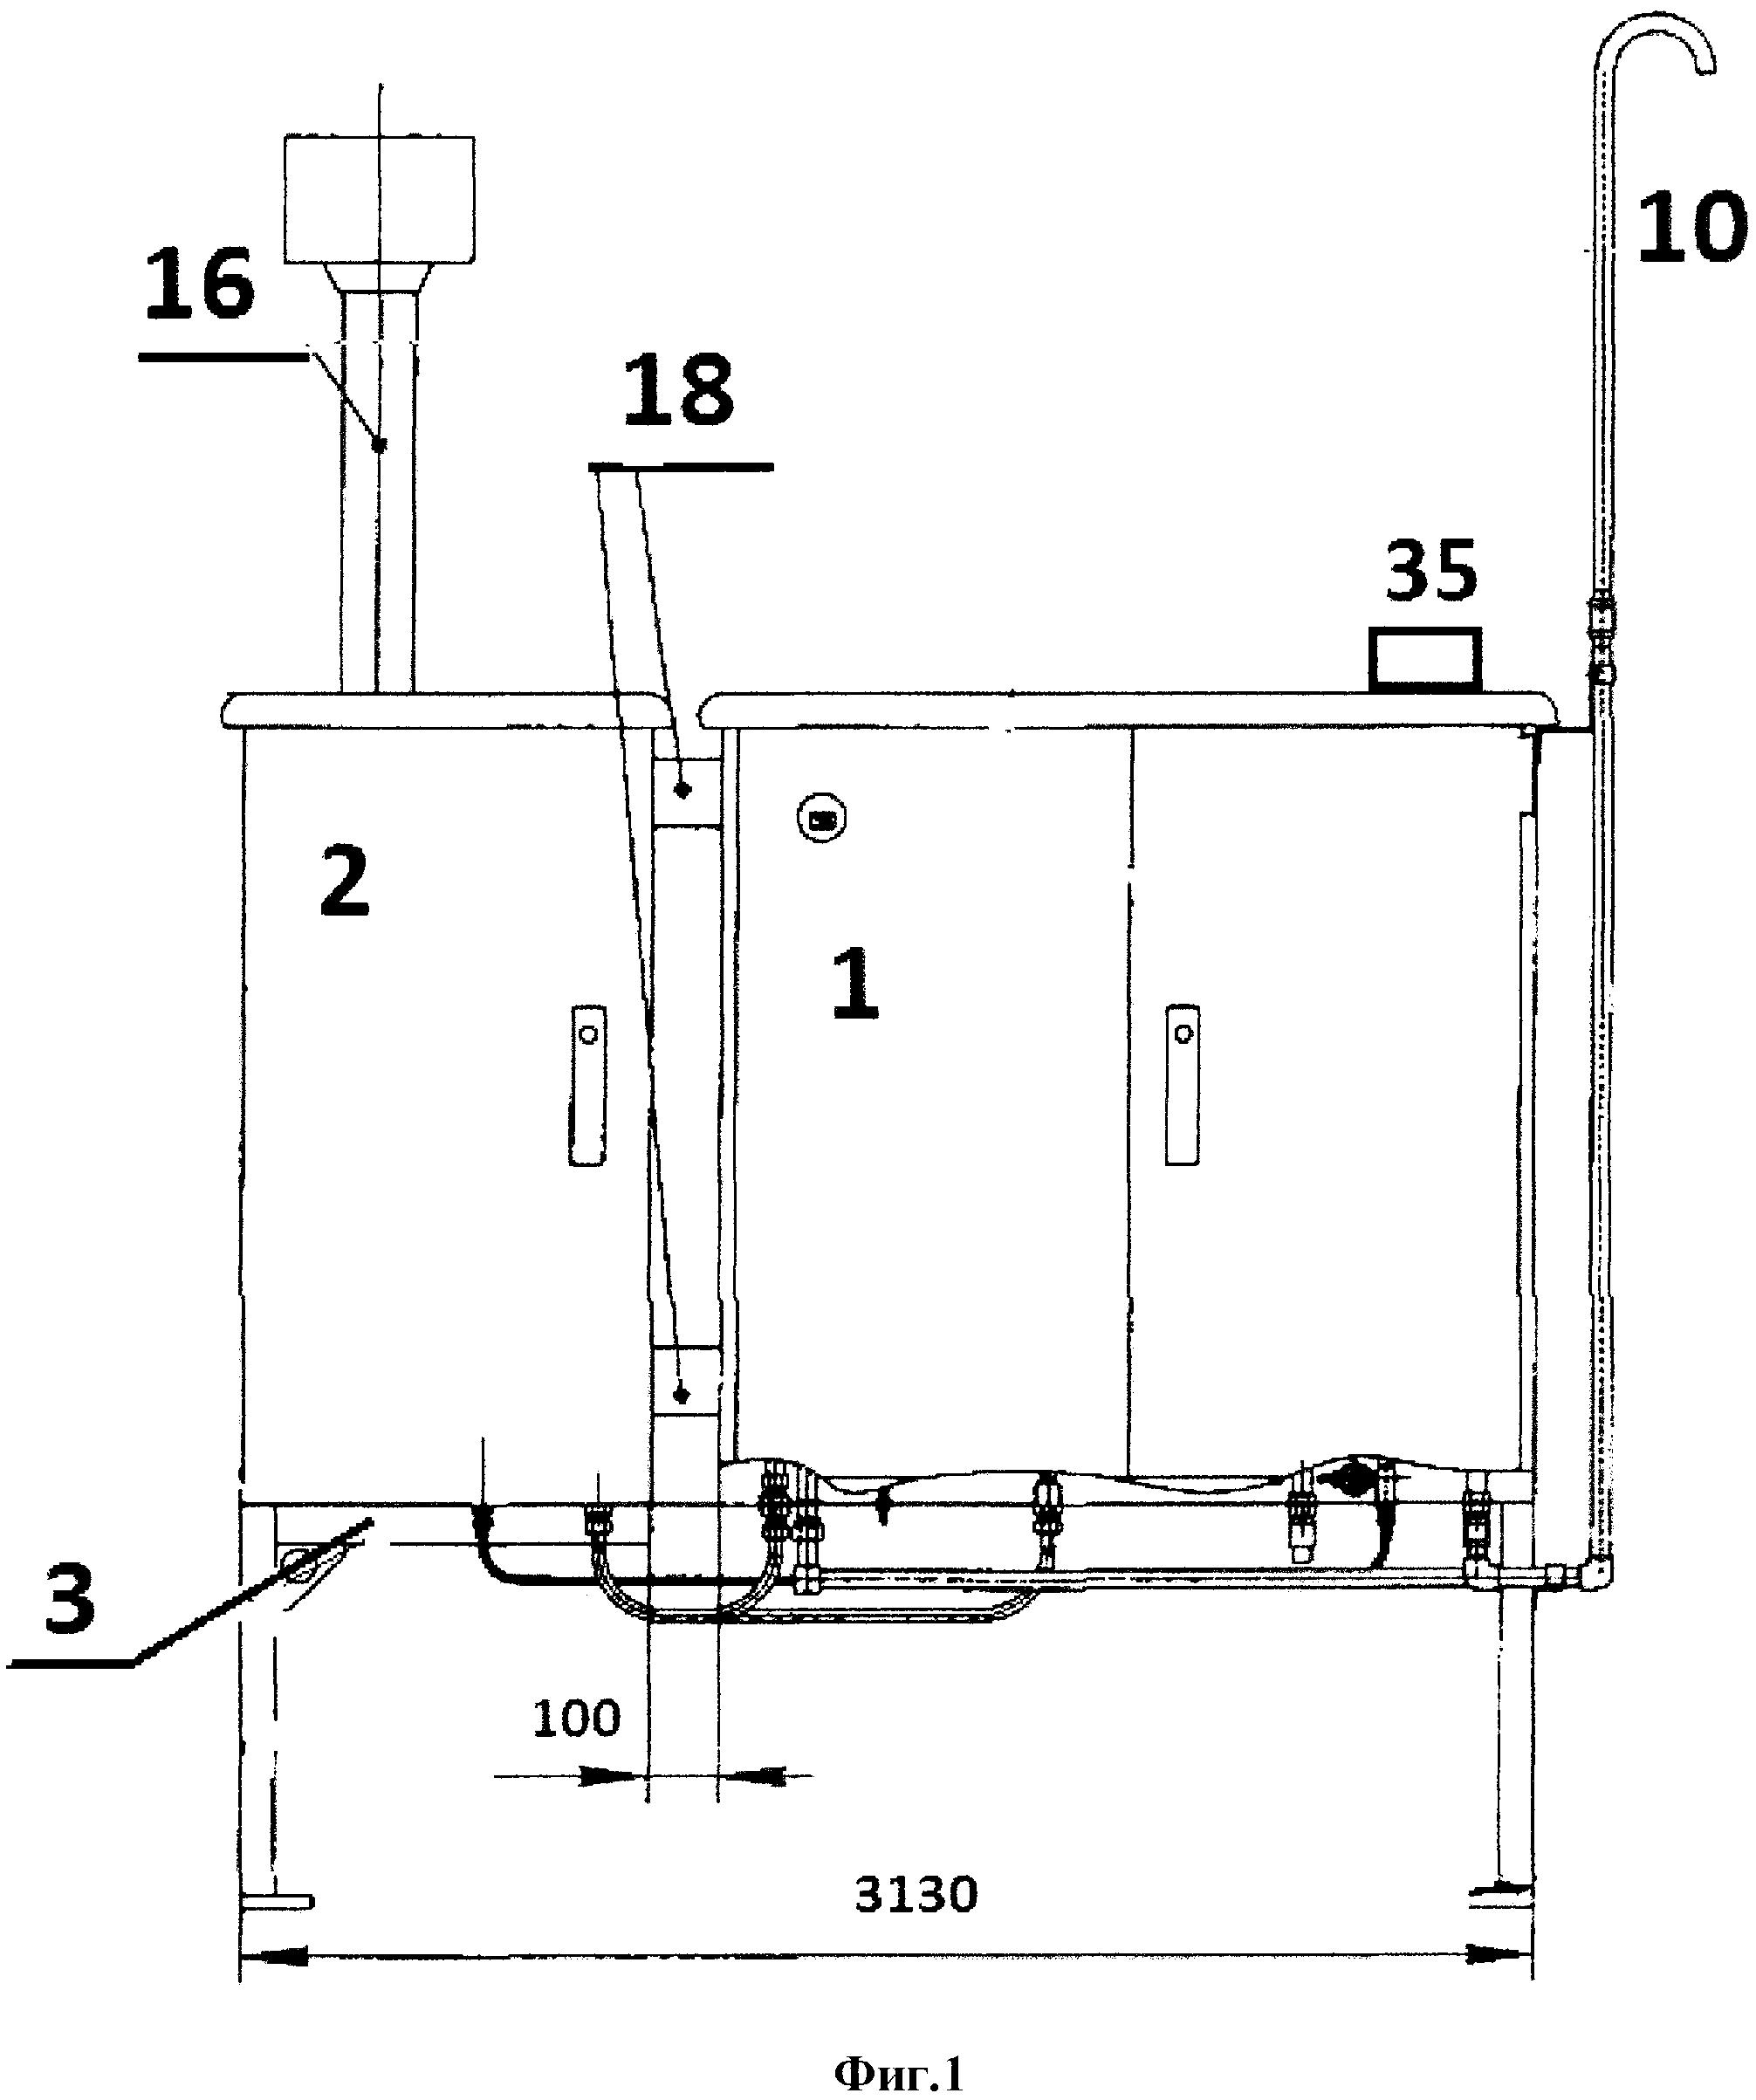 Автоматический газоредуцирующий пункт